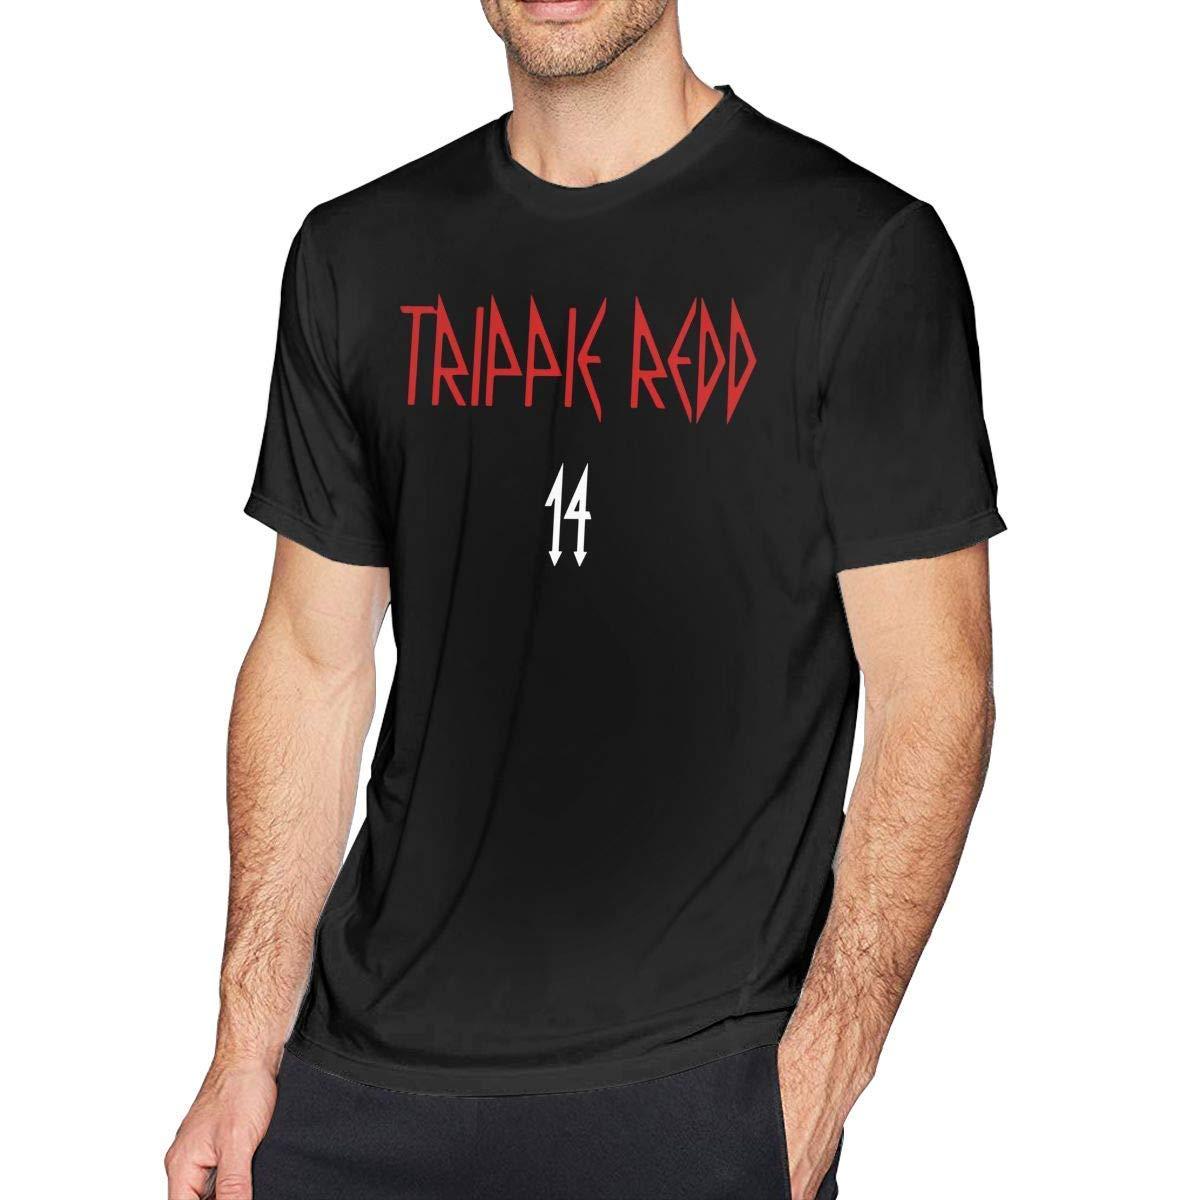 Alalal S Cool Trippie D T Shirts 6660